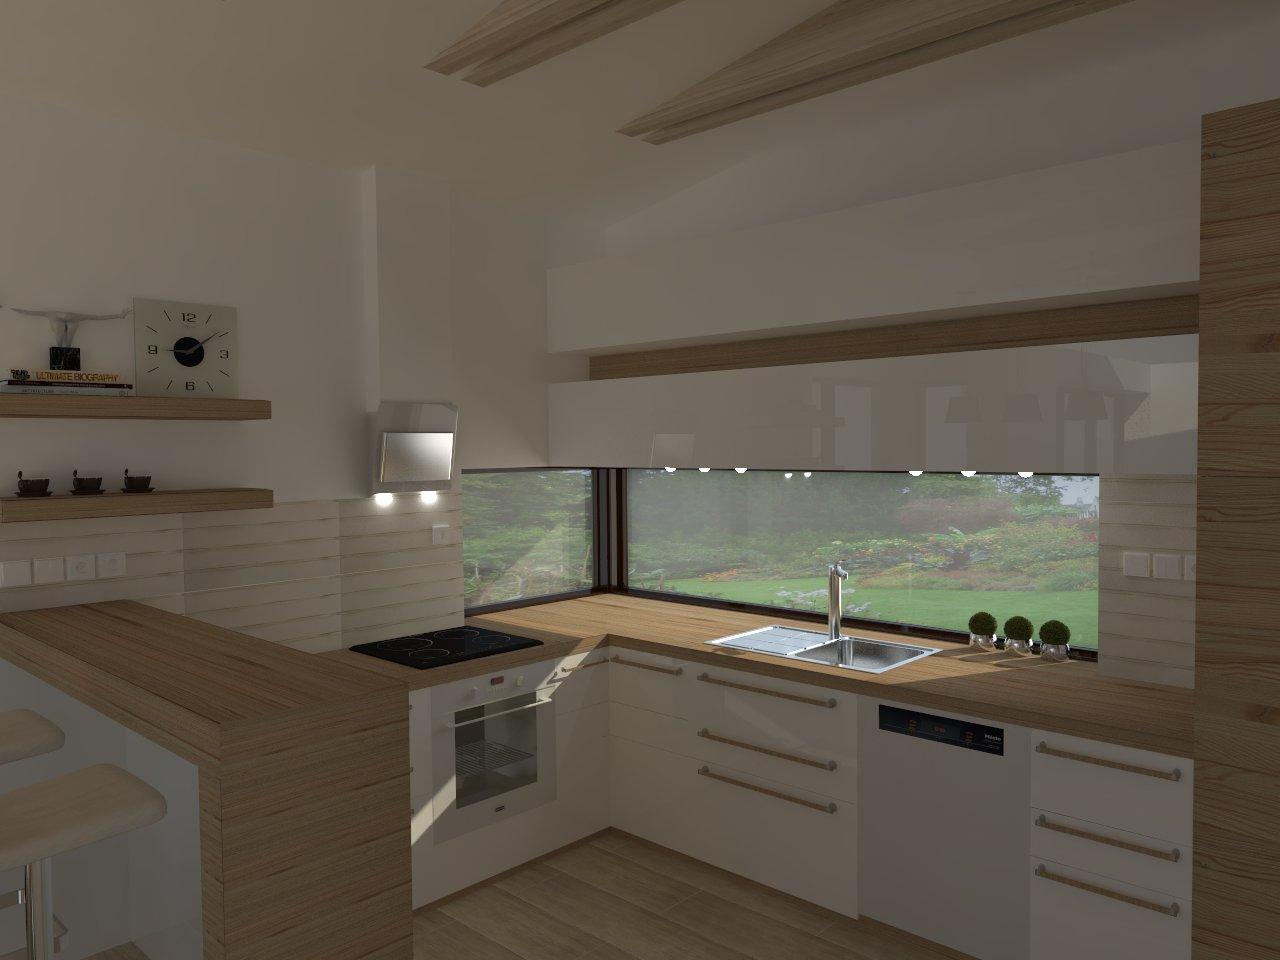 Bungalov s pultovymi strechami - zaciname pomaly vyberat kuchynu